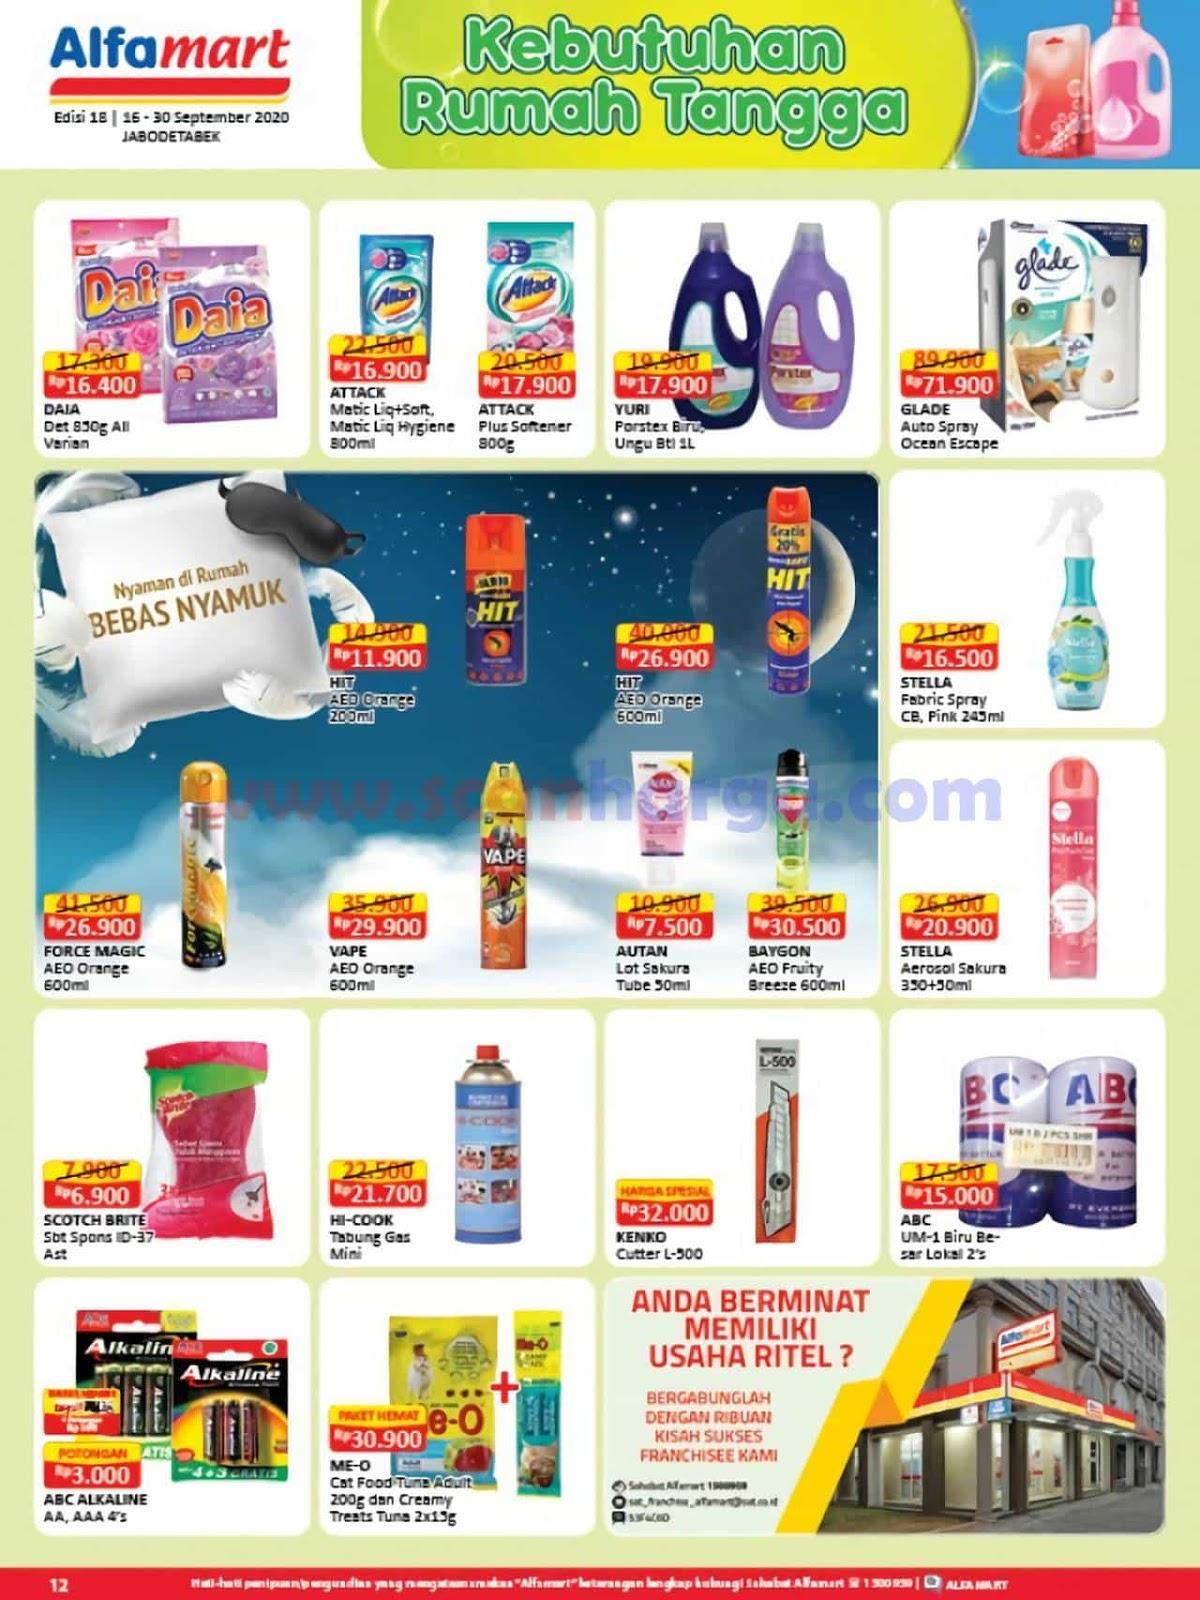 Katalog Promo Alfamart 16 - 30 September 2020 12